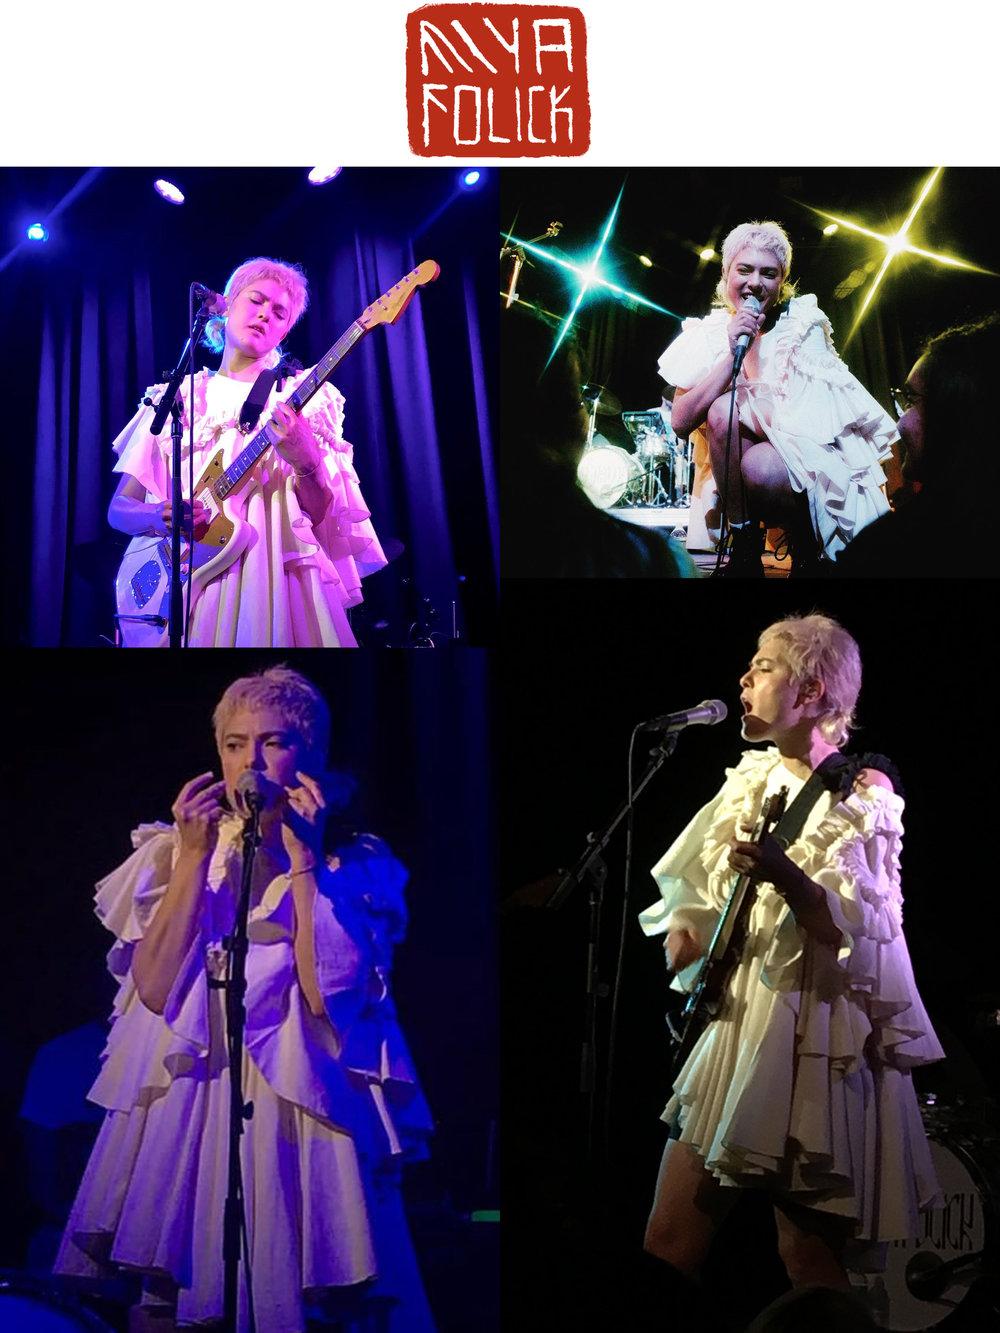 Miya Folick plays Elsewhere concert bushwick brooklyn nyc march 2nd 2019 wearing kelsey randall cream white flannel ruffle angel dress interscope records premonition tour